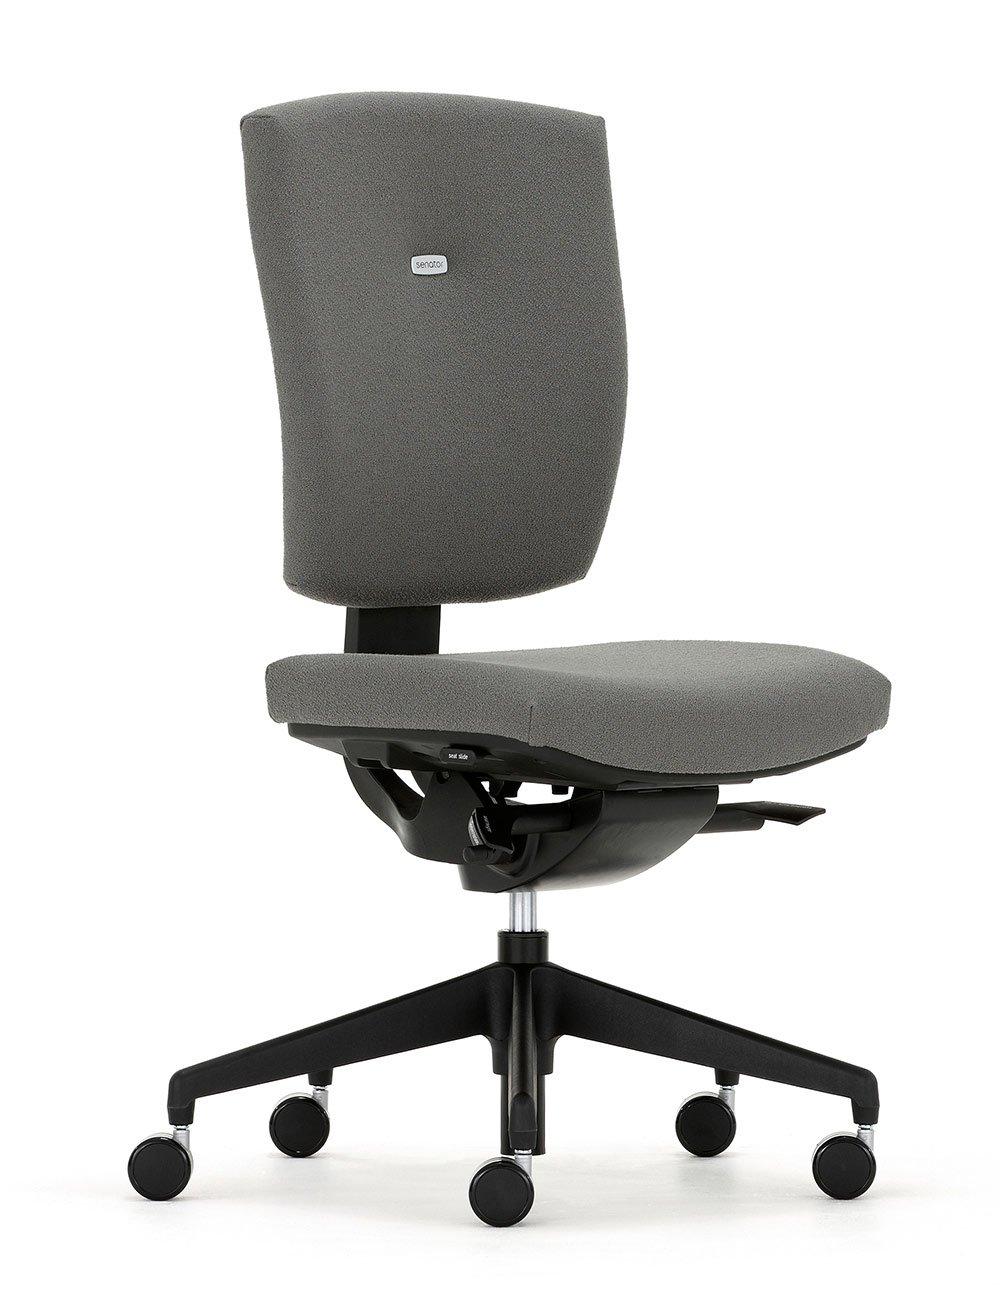 senator sprint chair online ergonomics